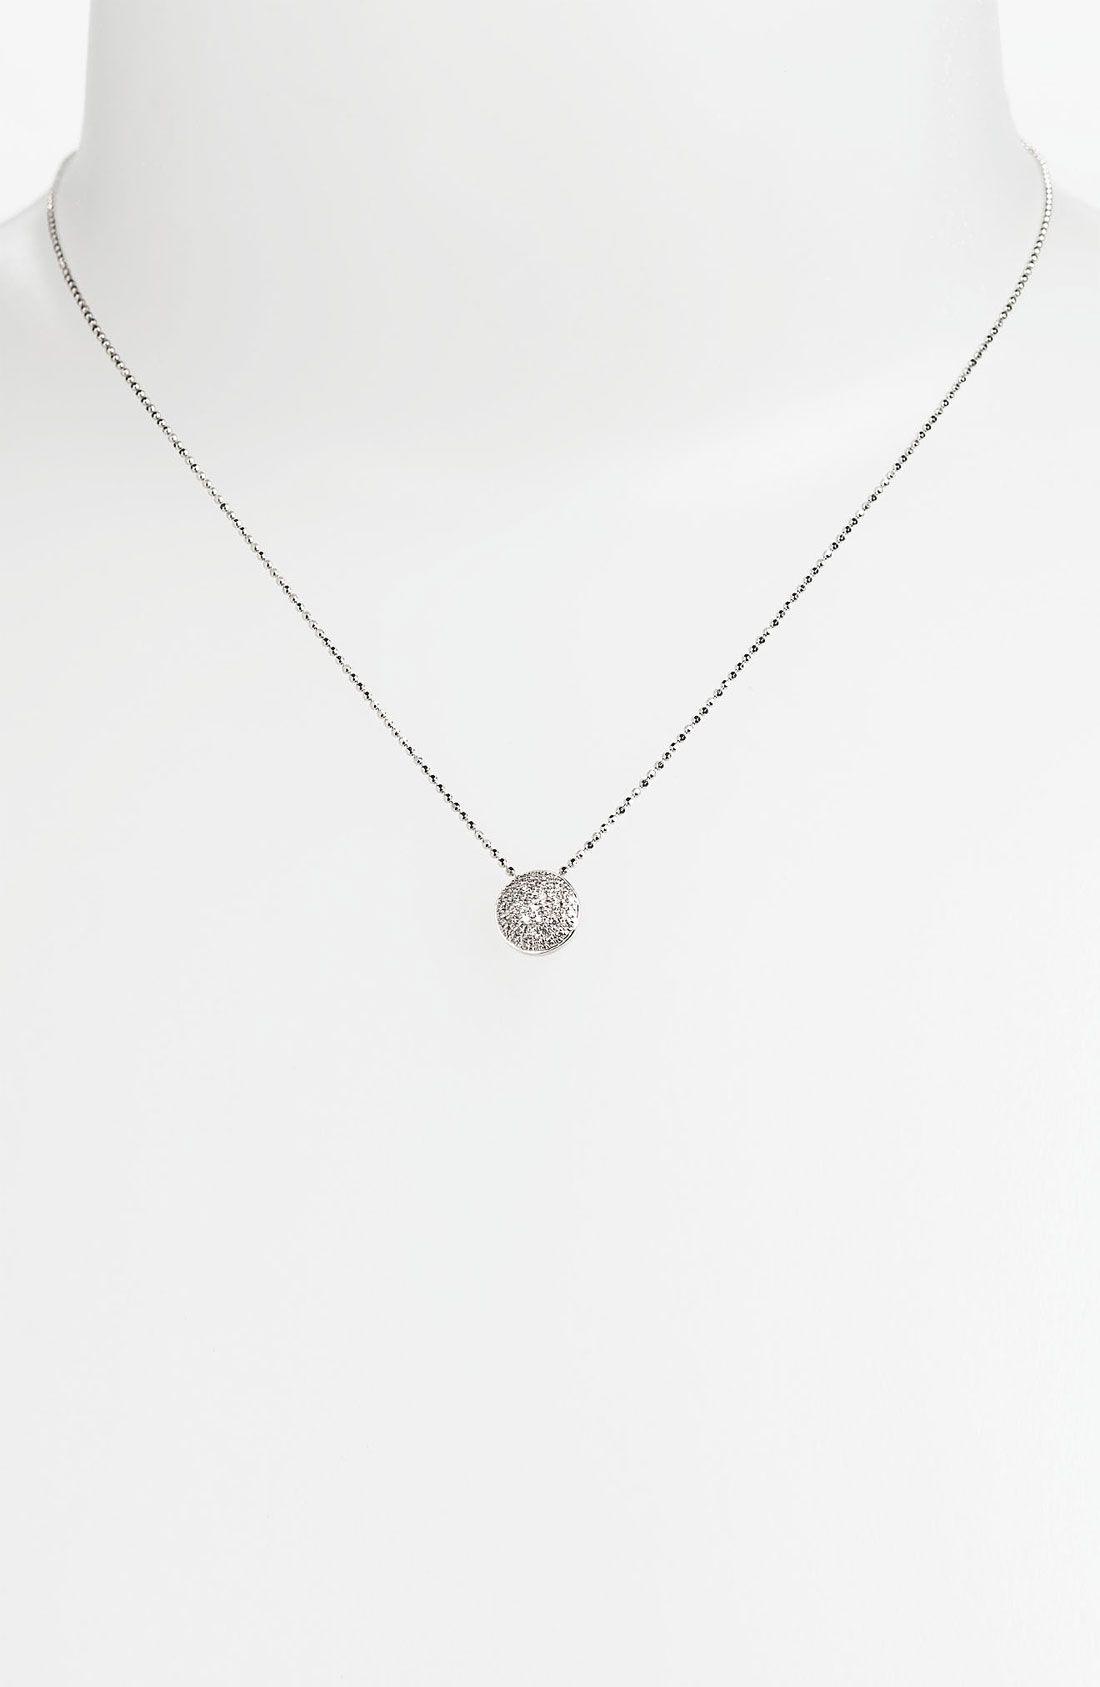 Diamond pendant necklaces for women necklace pinterest batu diamond pendant necklaces for women aloadofball Images